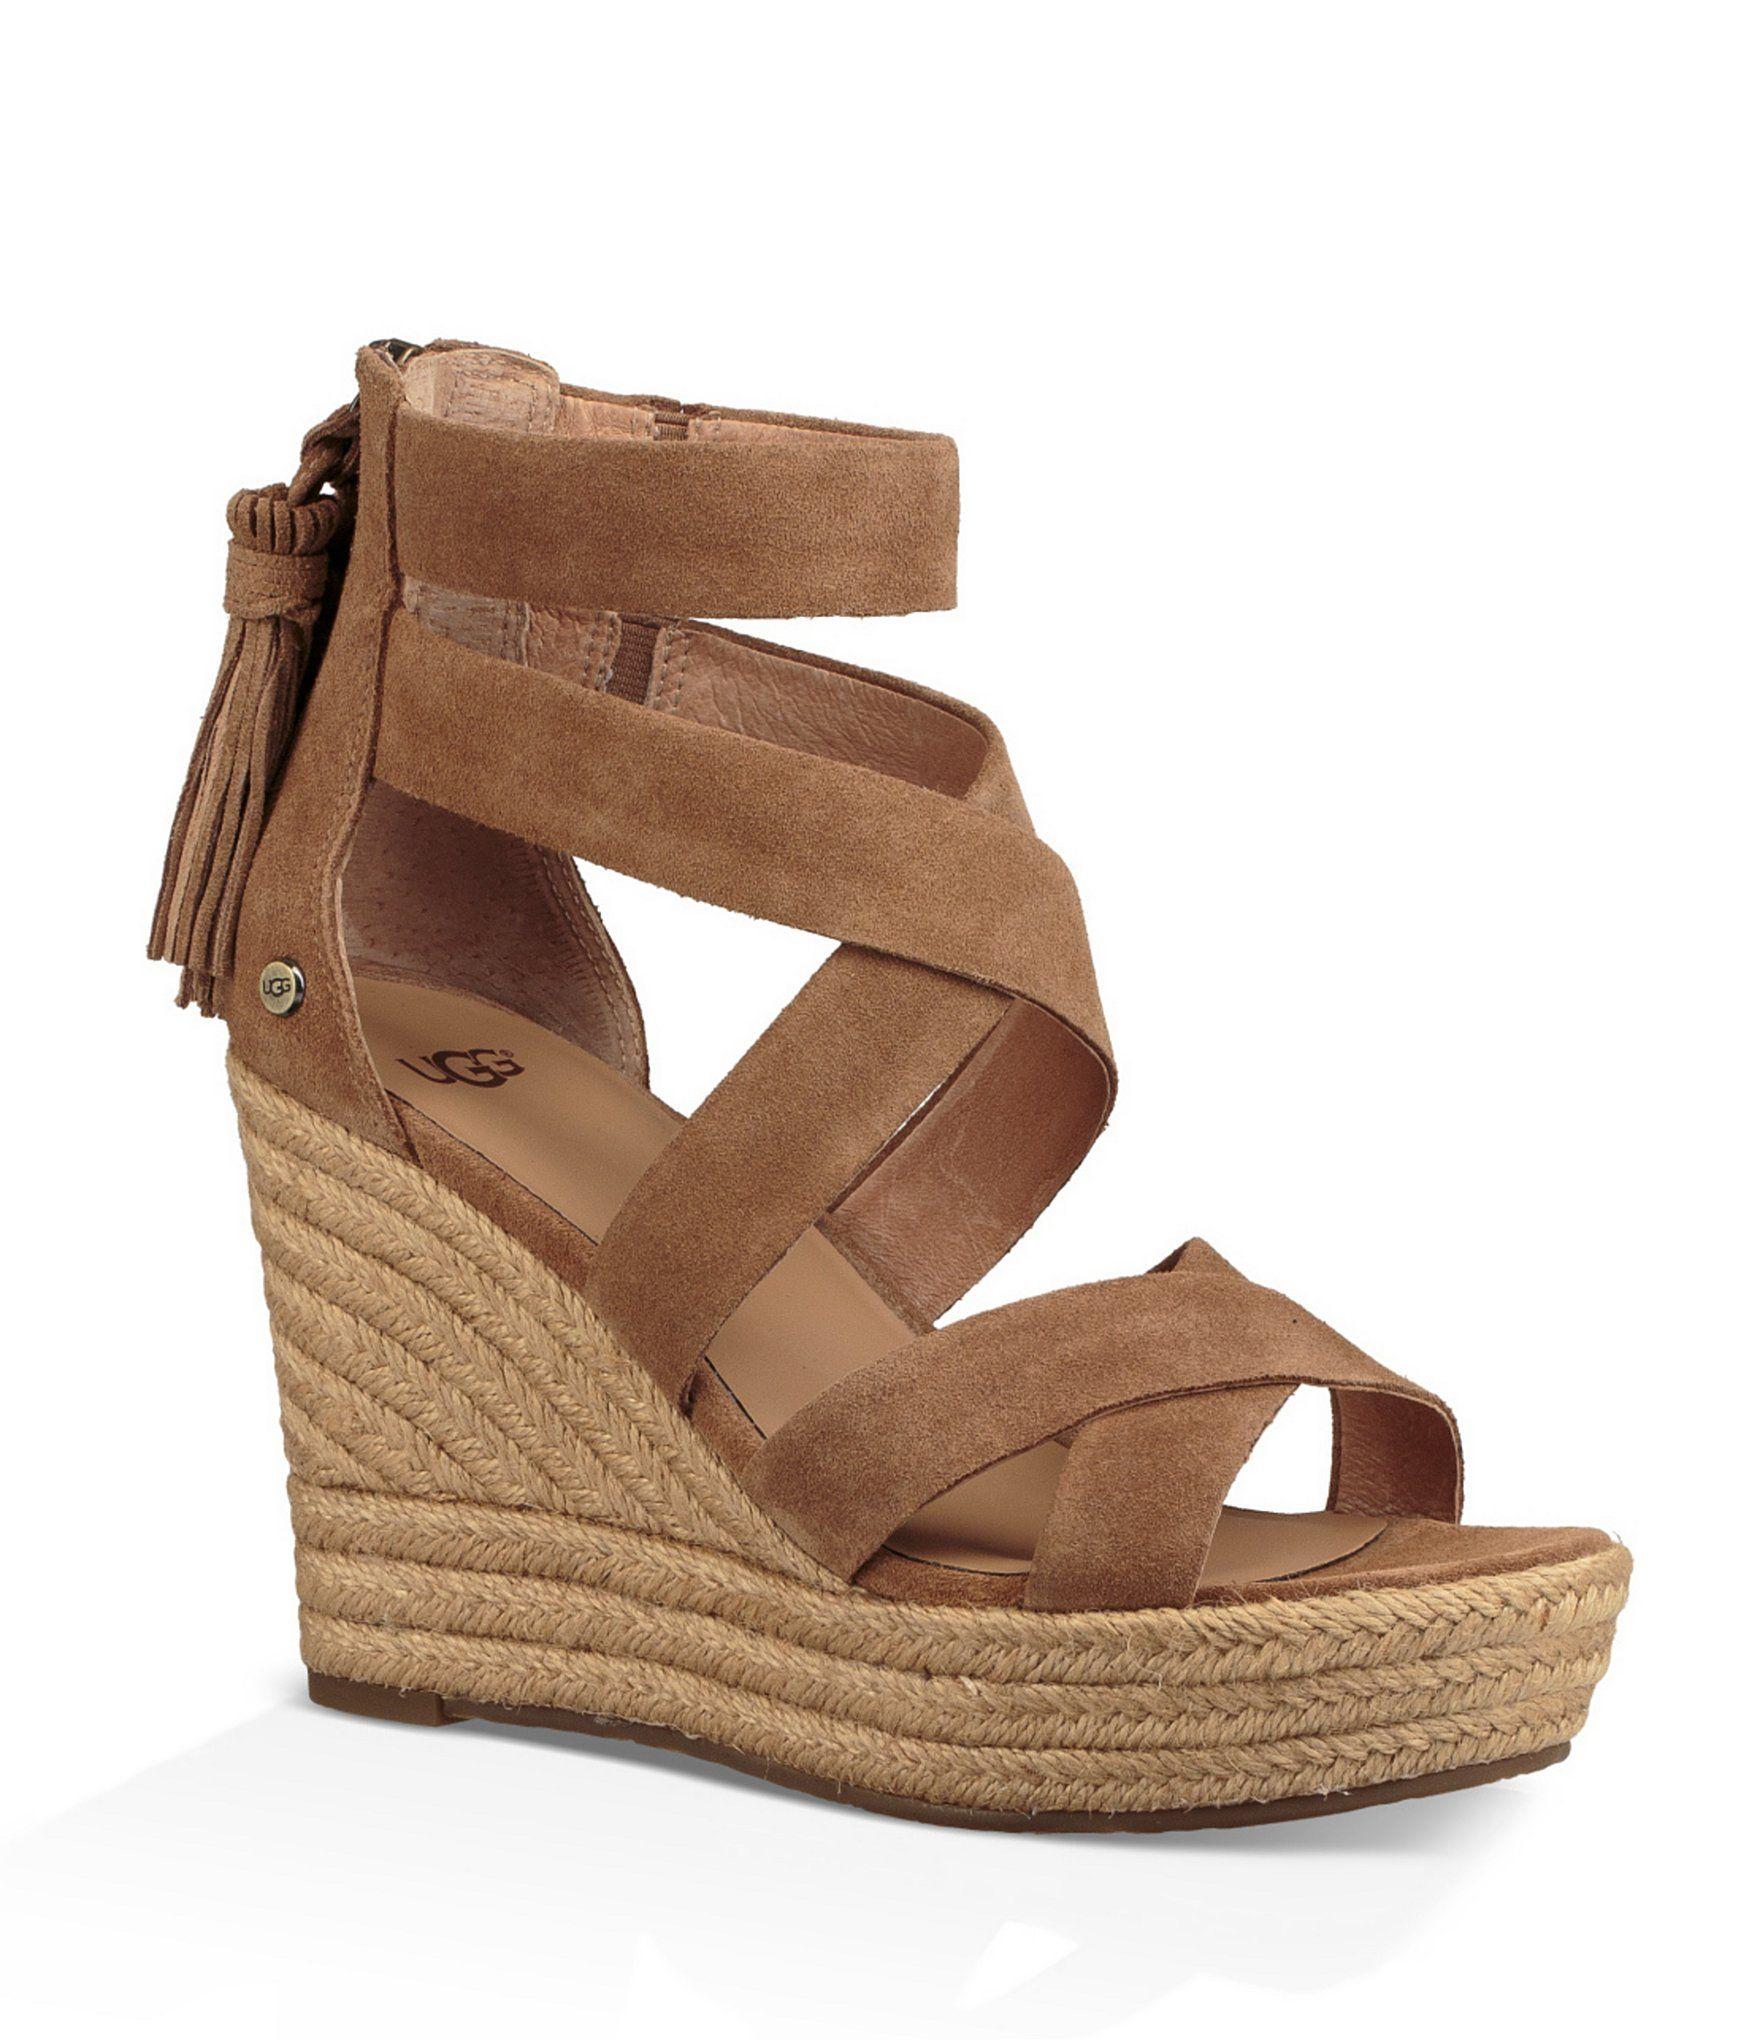 bd1e869eb39 UGG Raquel Suede Back Zip Tassel Espadrille Wedge Sandals  Dillards ...